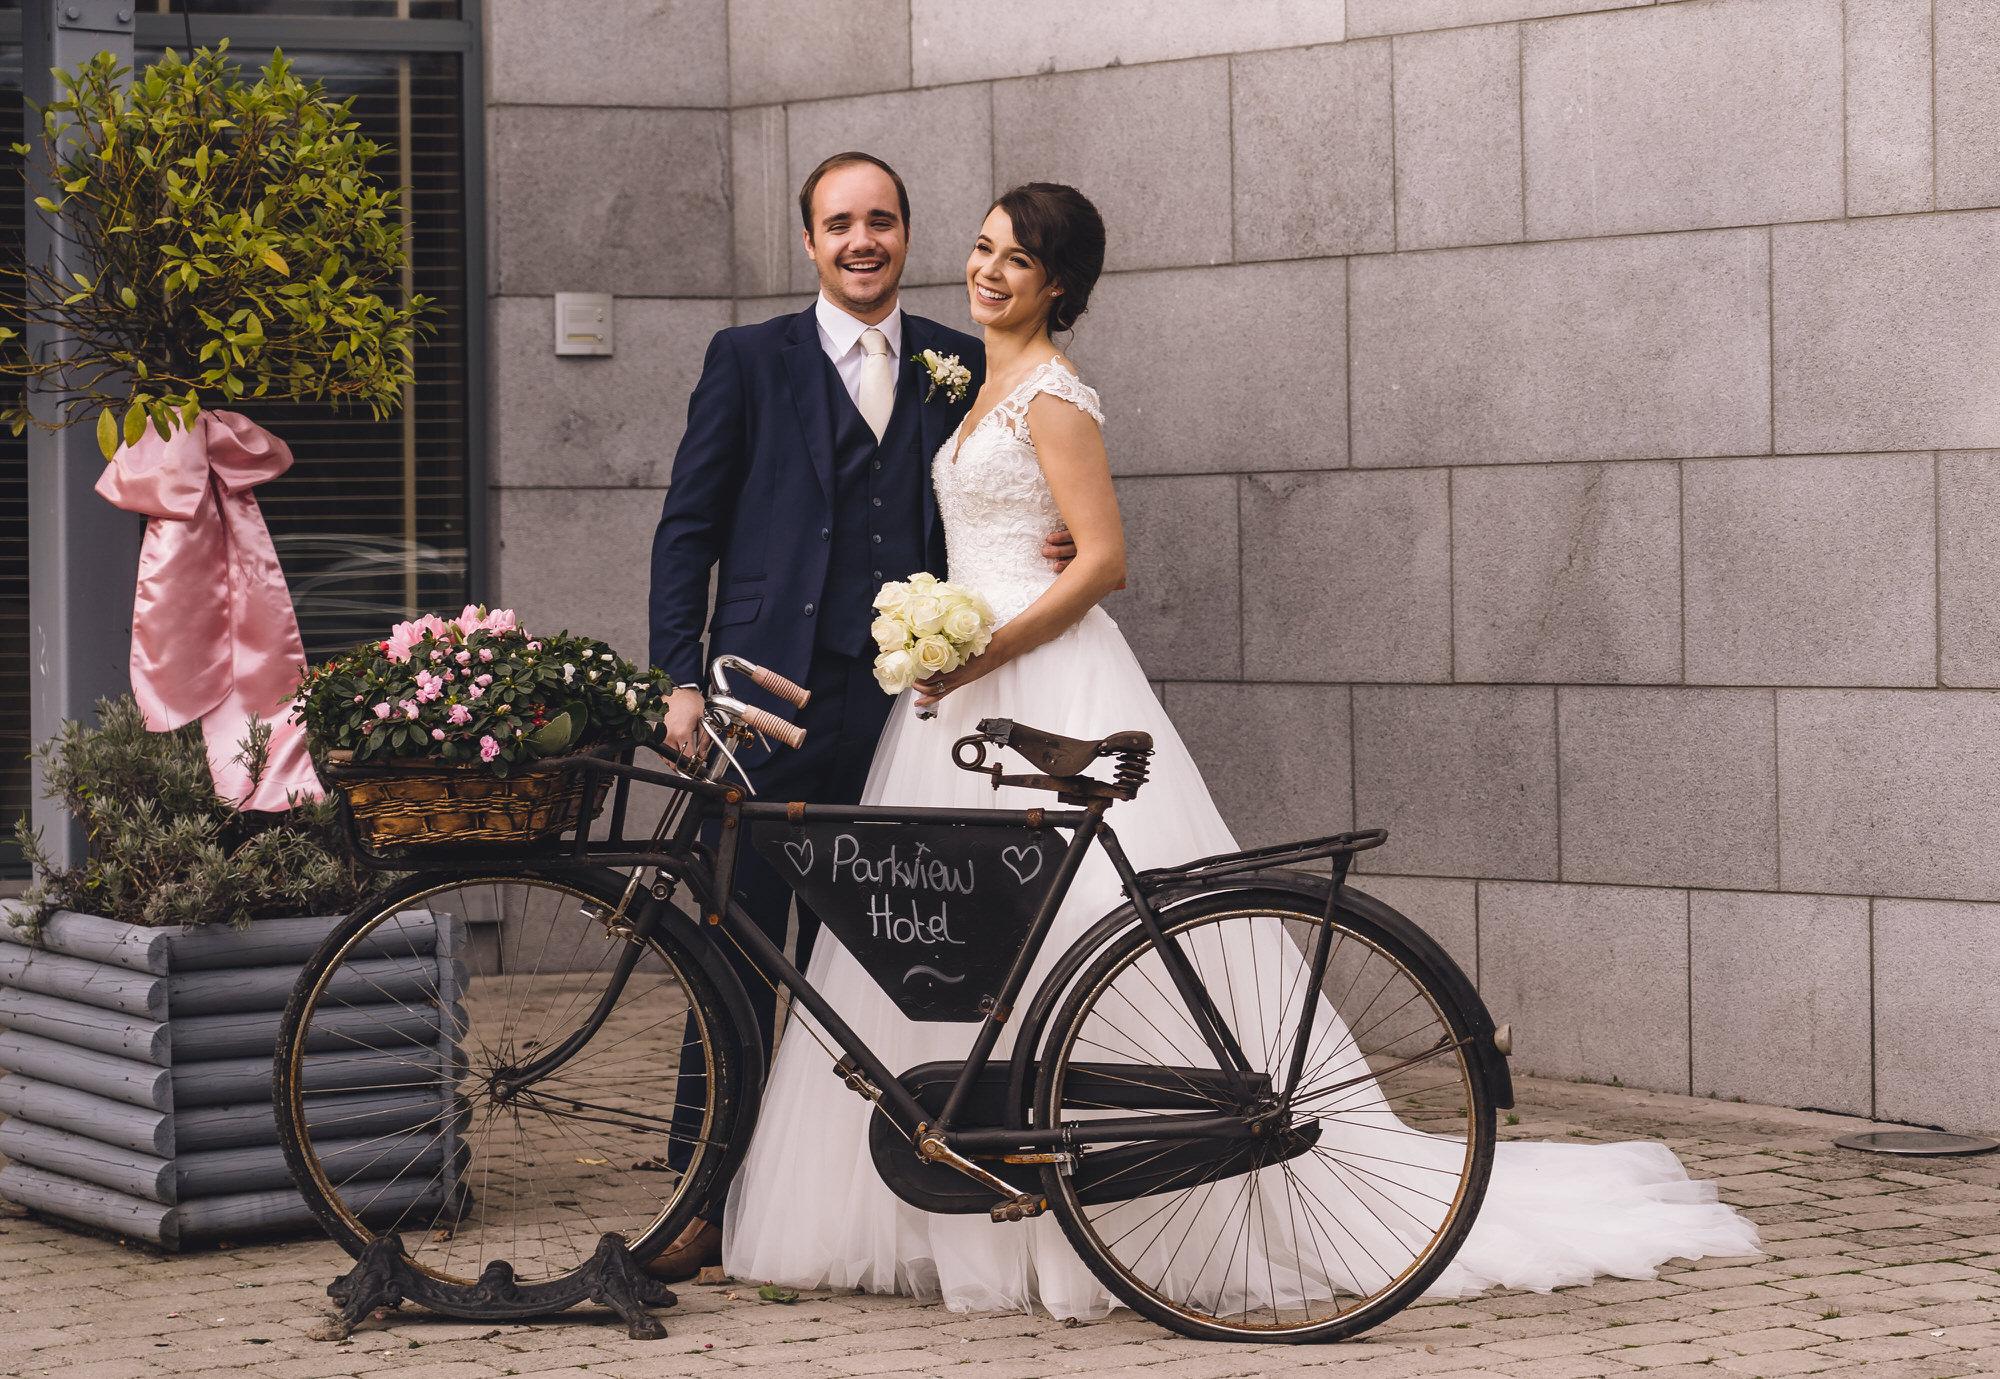 Roger-kenny-wedding-photographer-wicklow_125.jpg